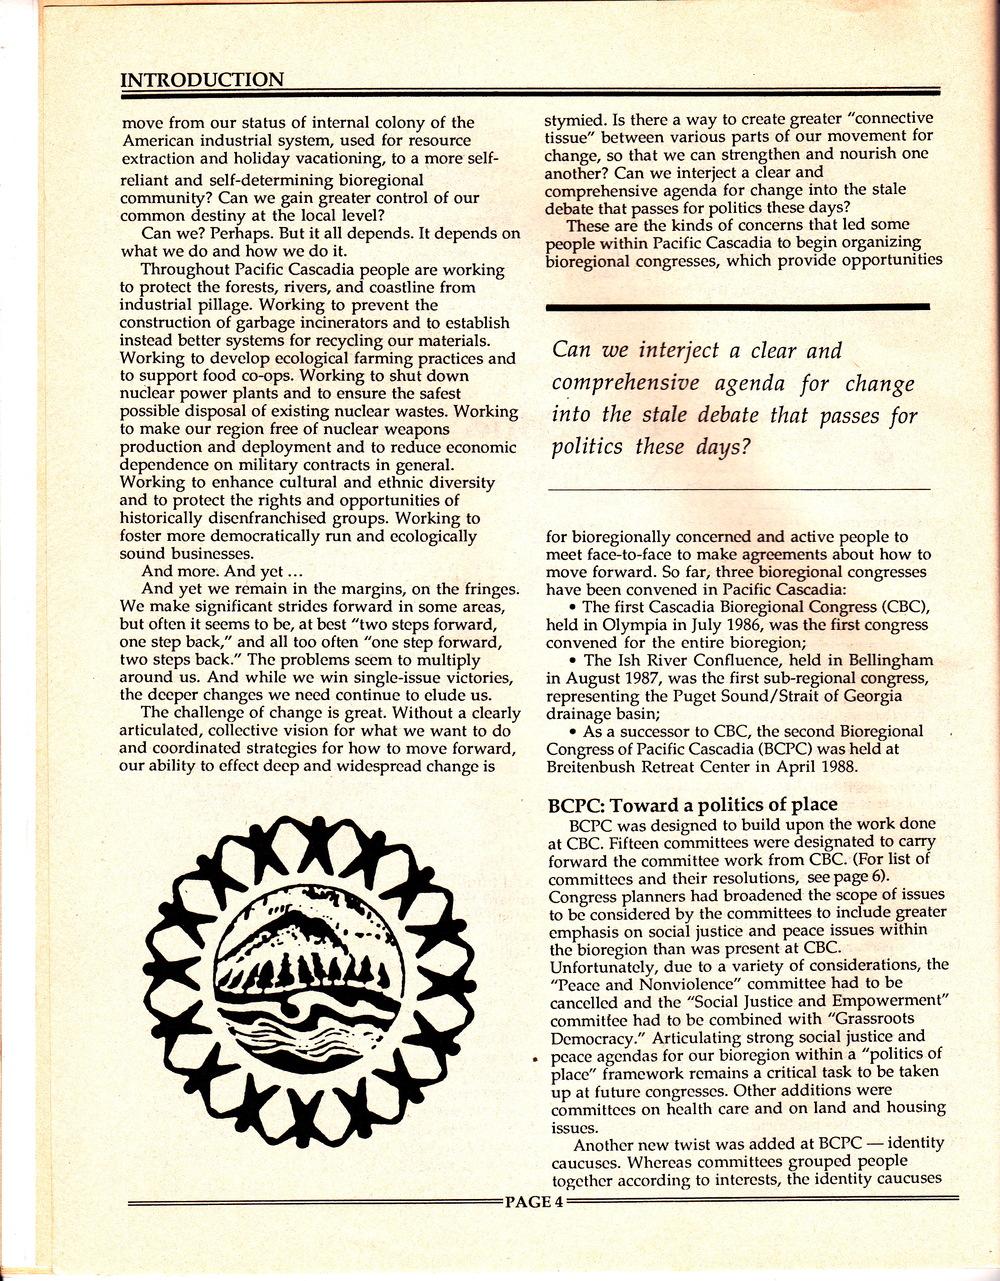 Cascadia Bioregional Congress 1986 Proceedings_0024.jpg